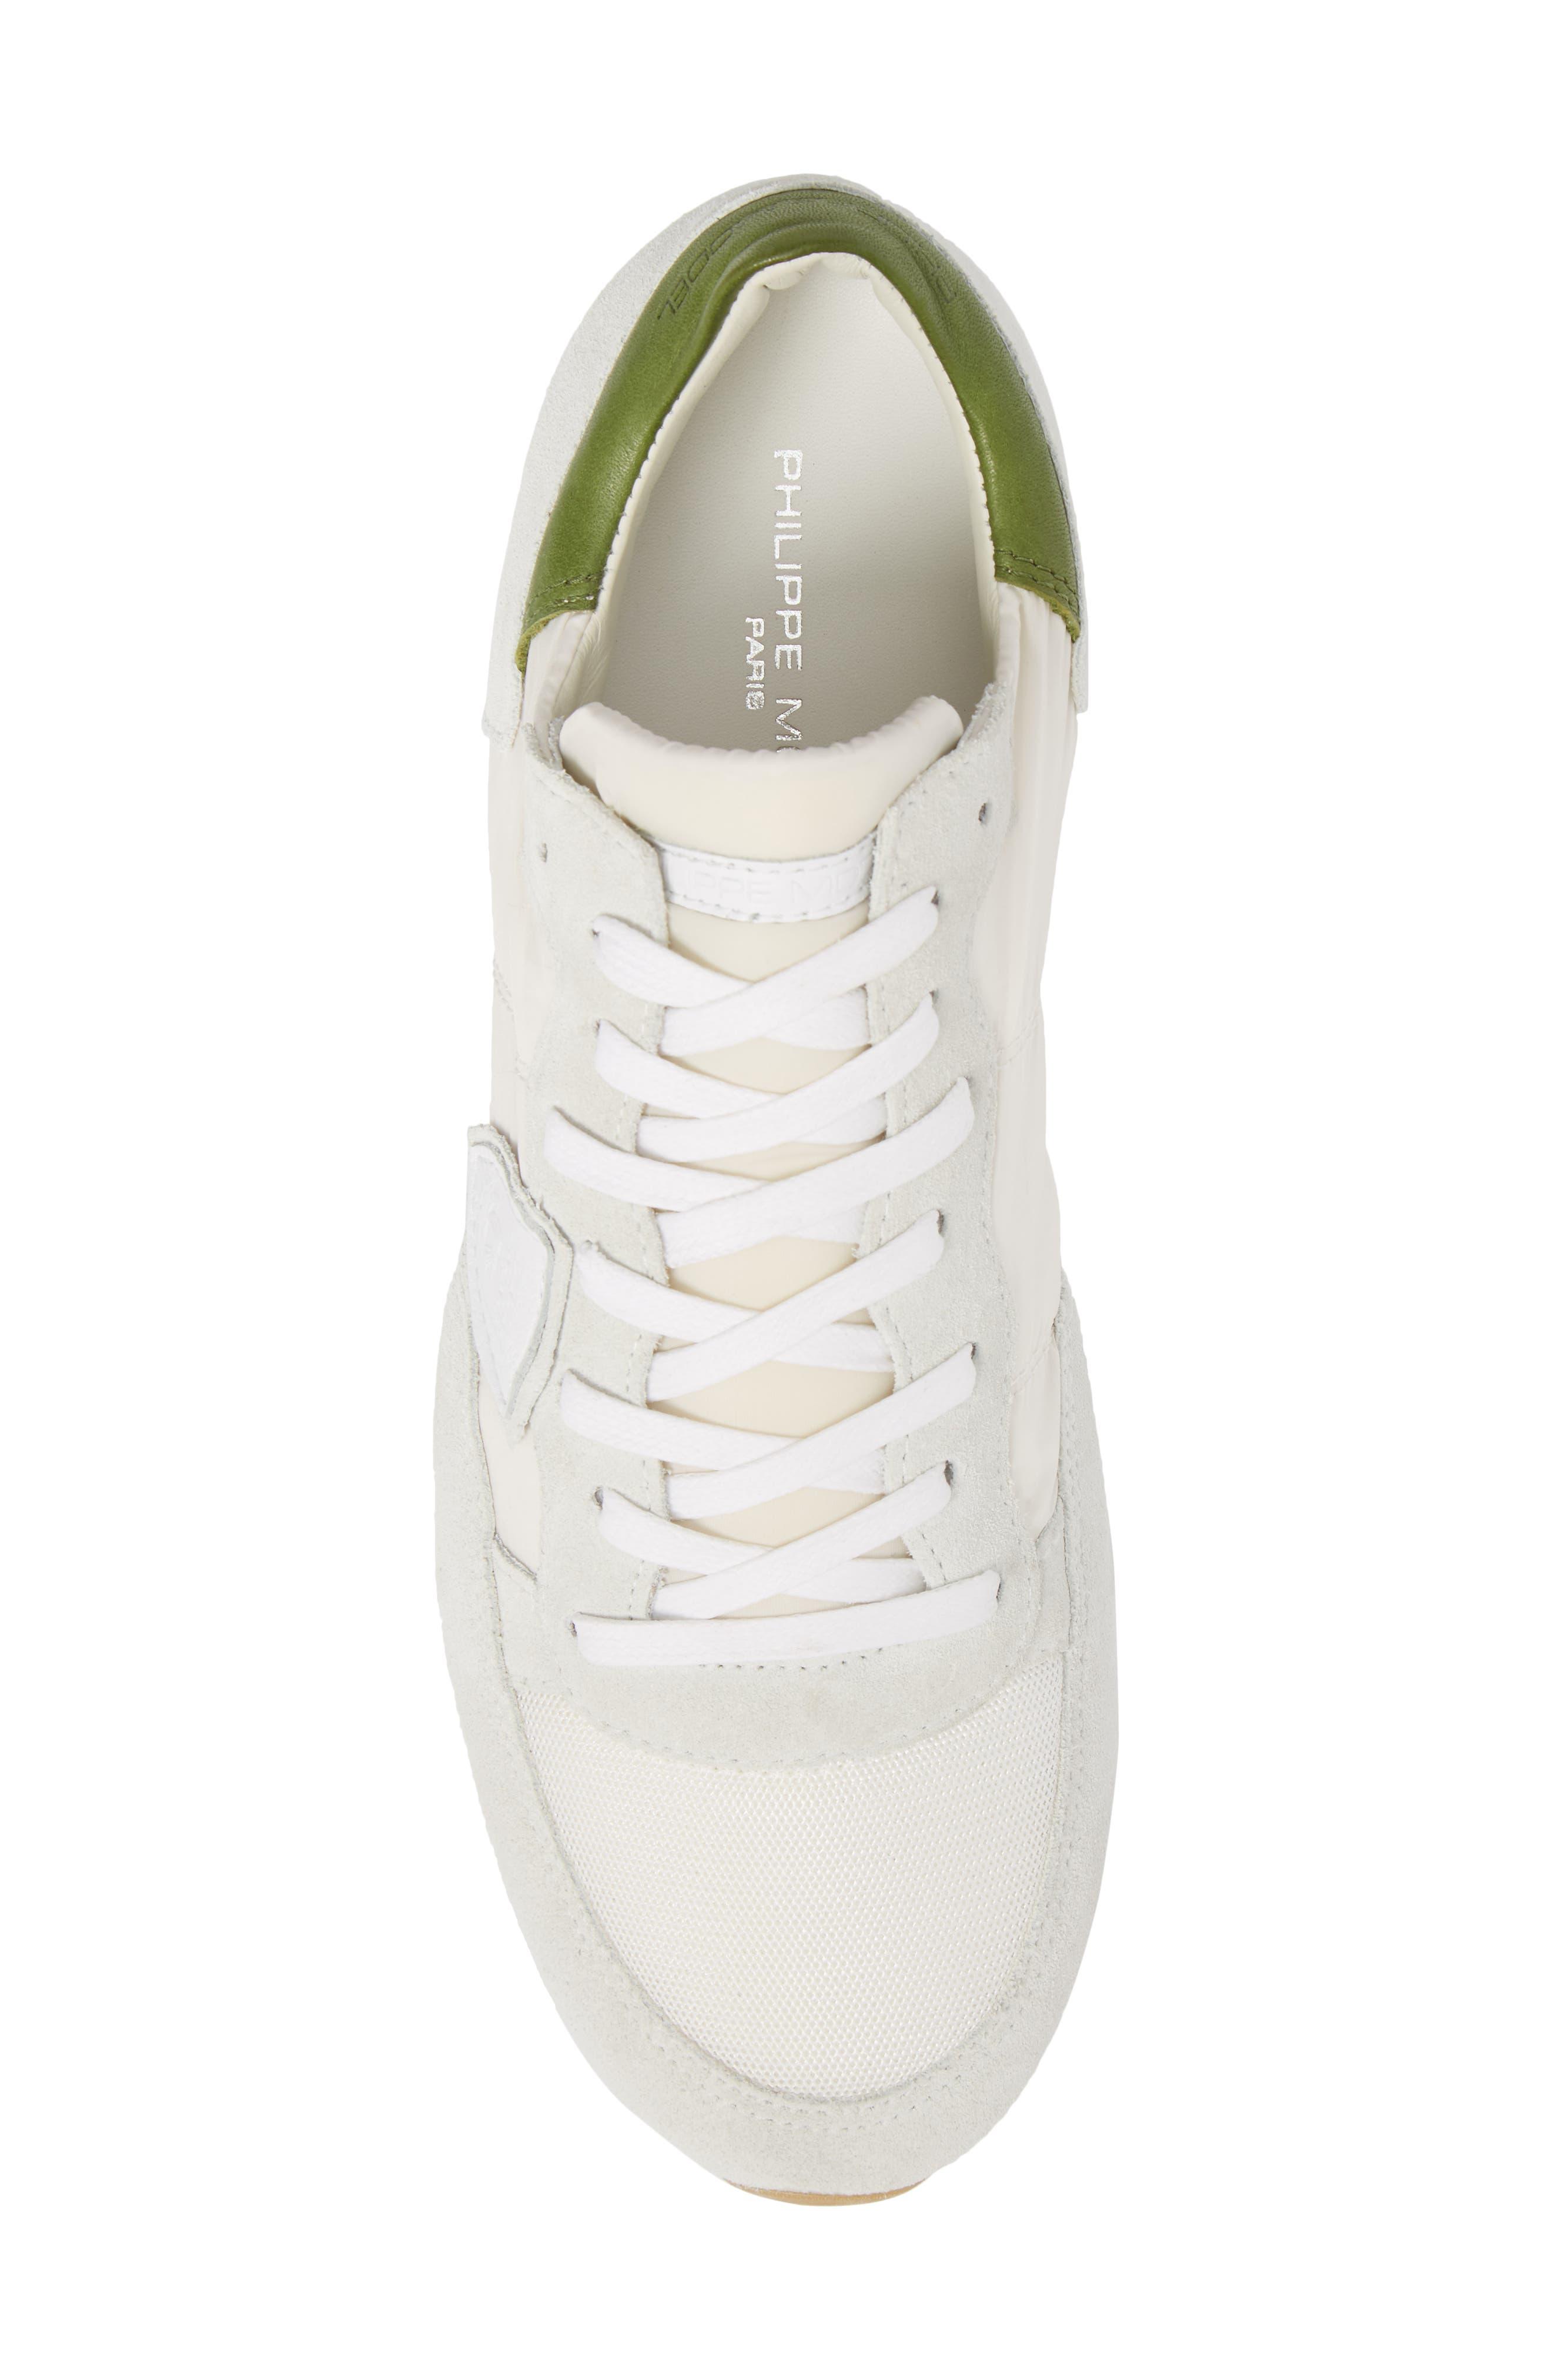 Tropez Sneaker,                             Alternate thumbnail 5, color,                             120